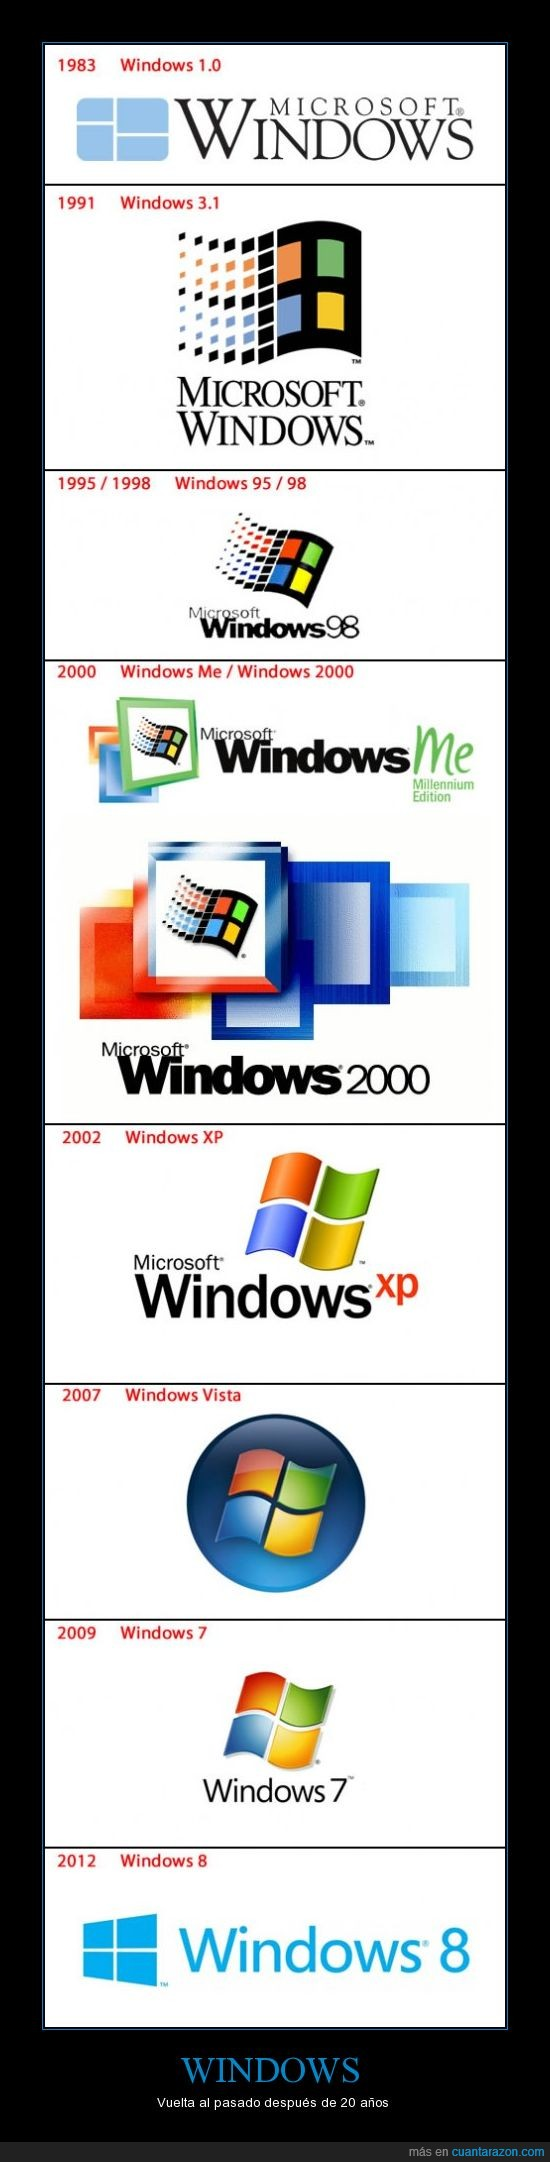 banderas,logos,logotipos,microsoft,ventanas,windows